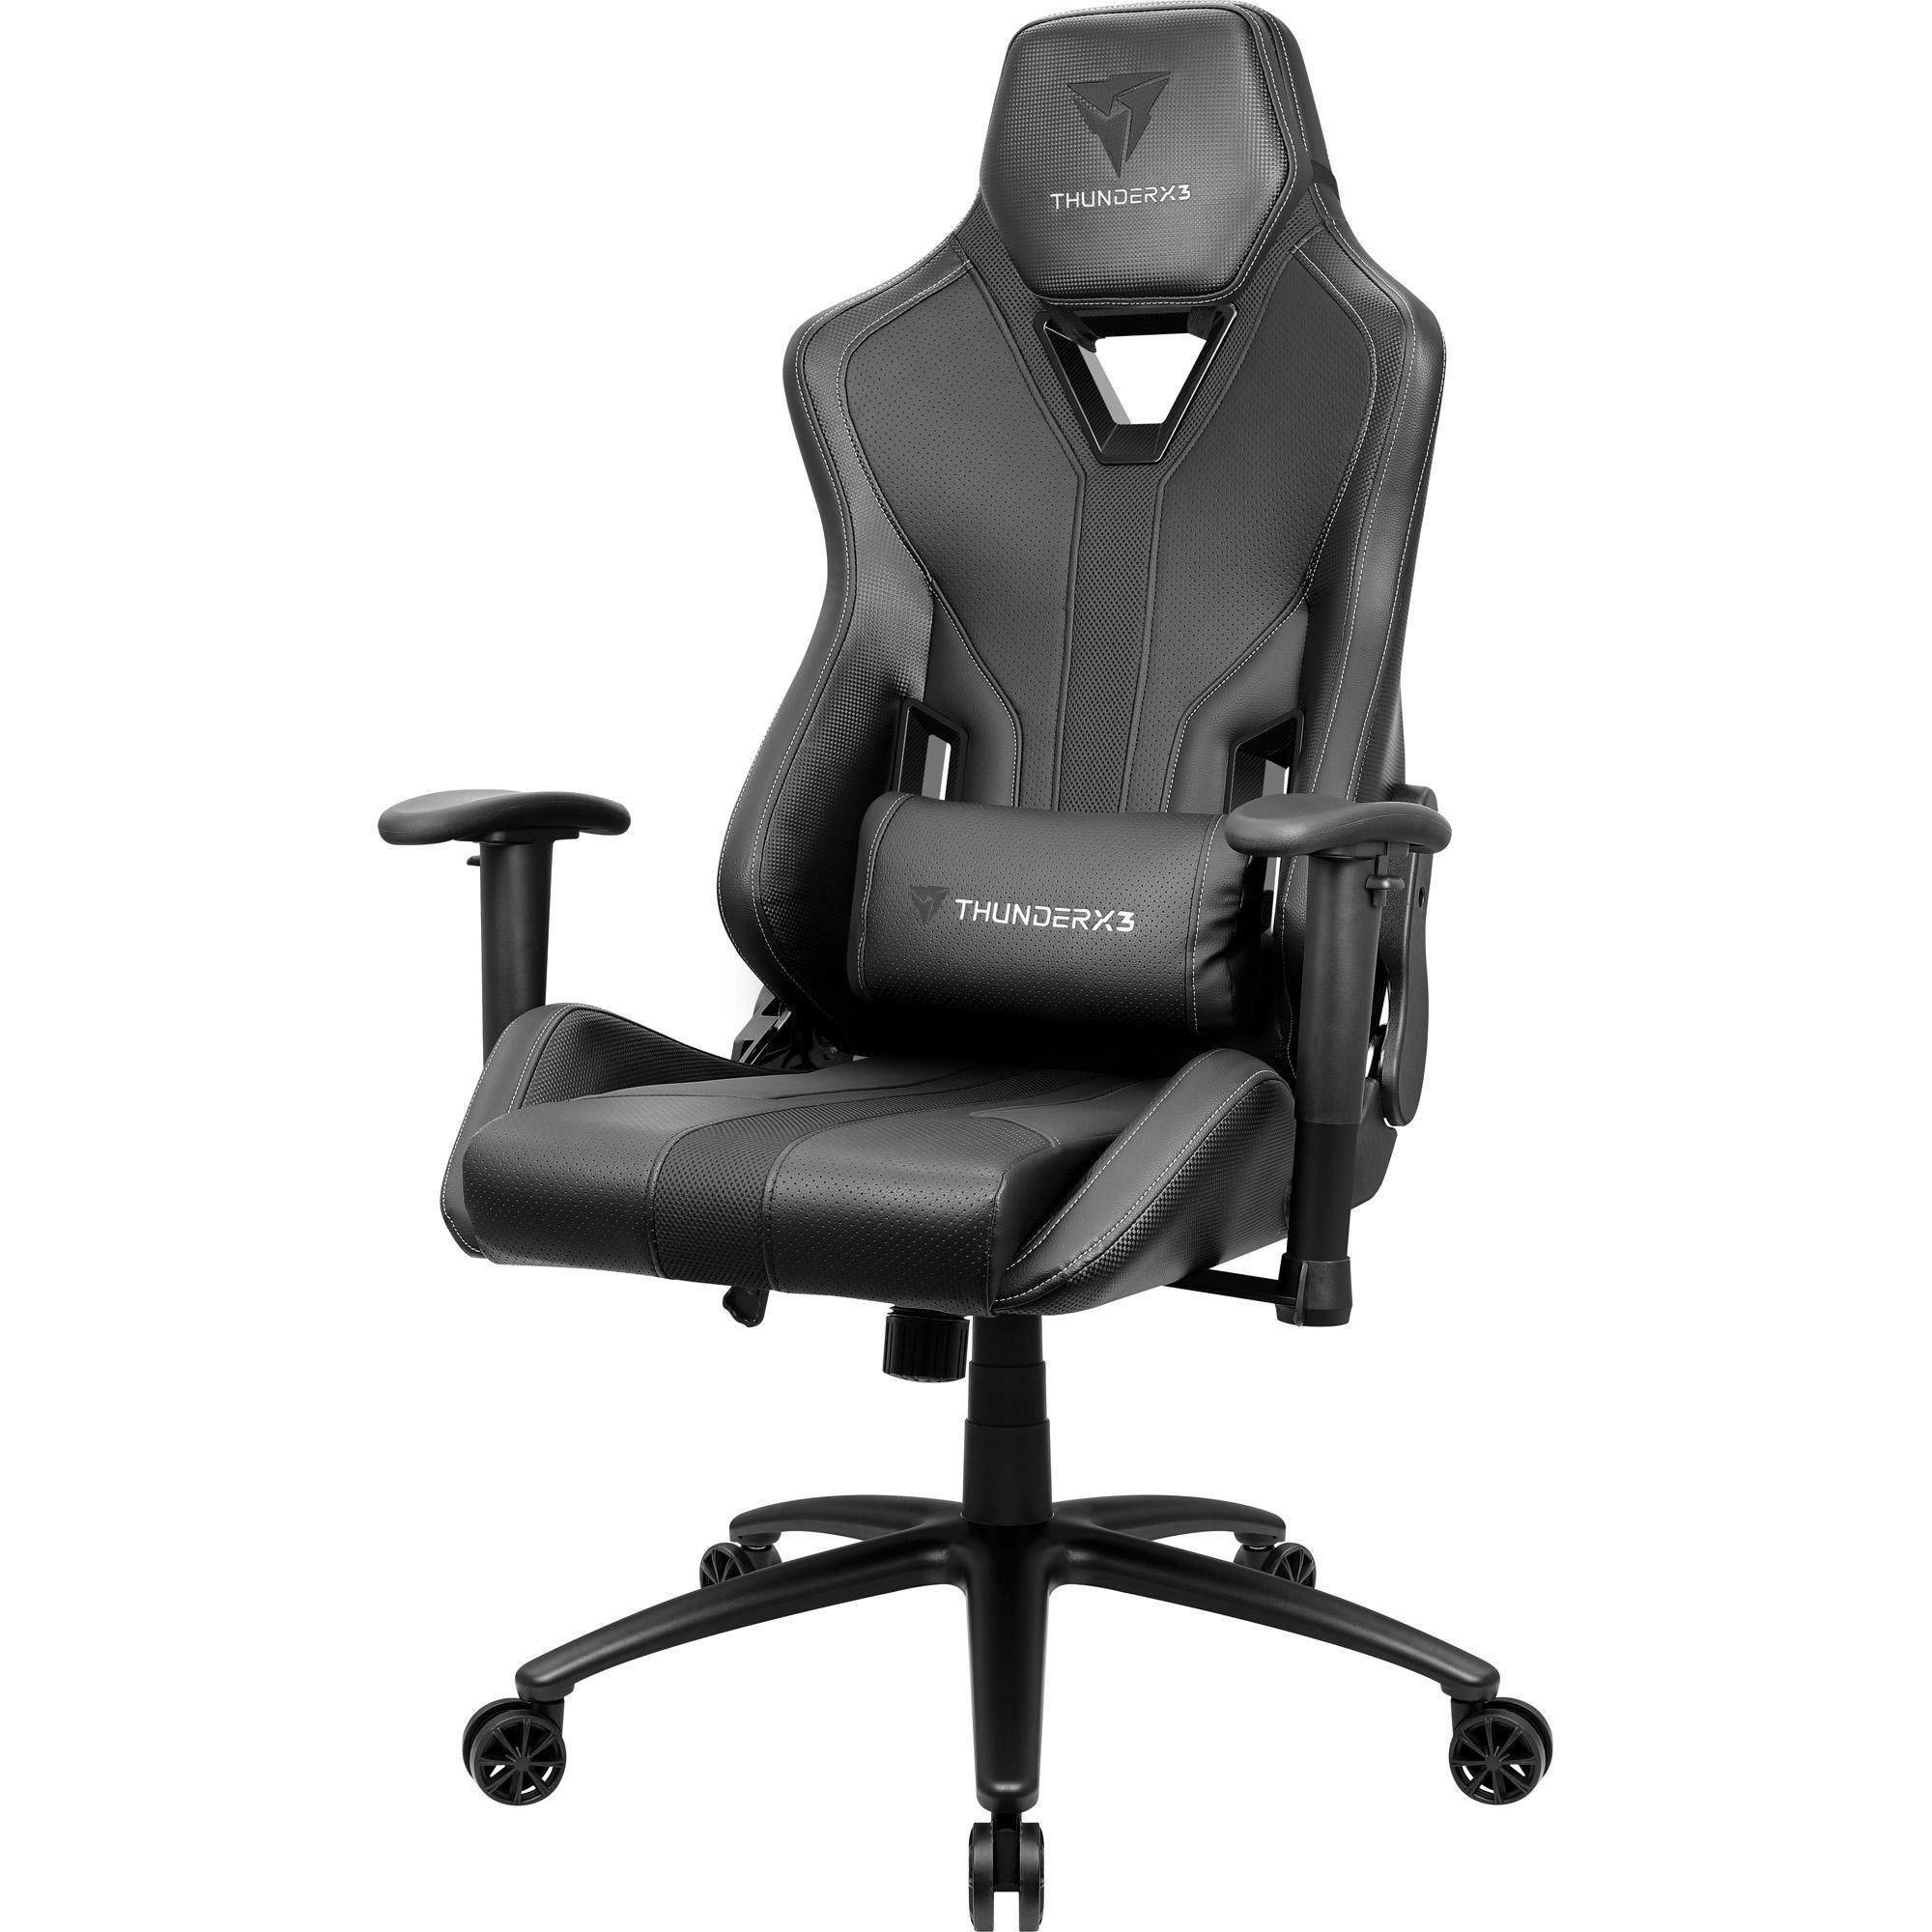 cadeira gamer veja isso thunderx3 yc3 preta 49581 2000 200637